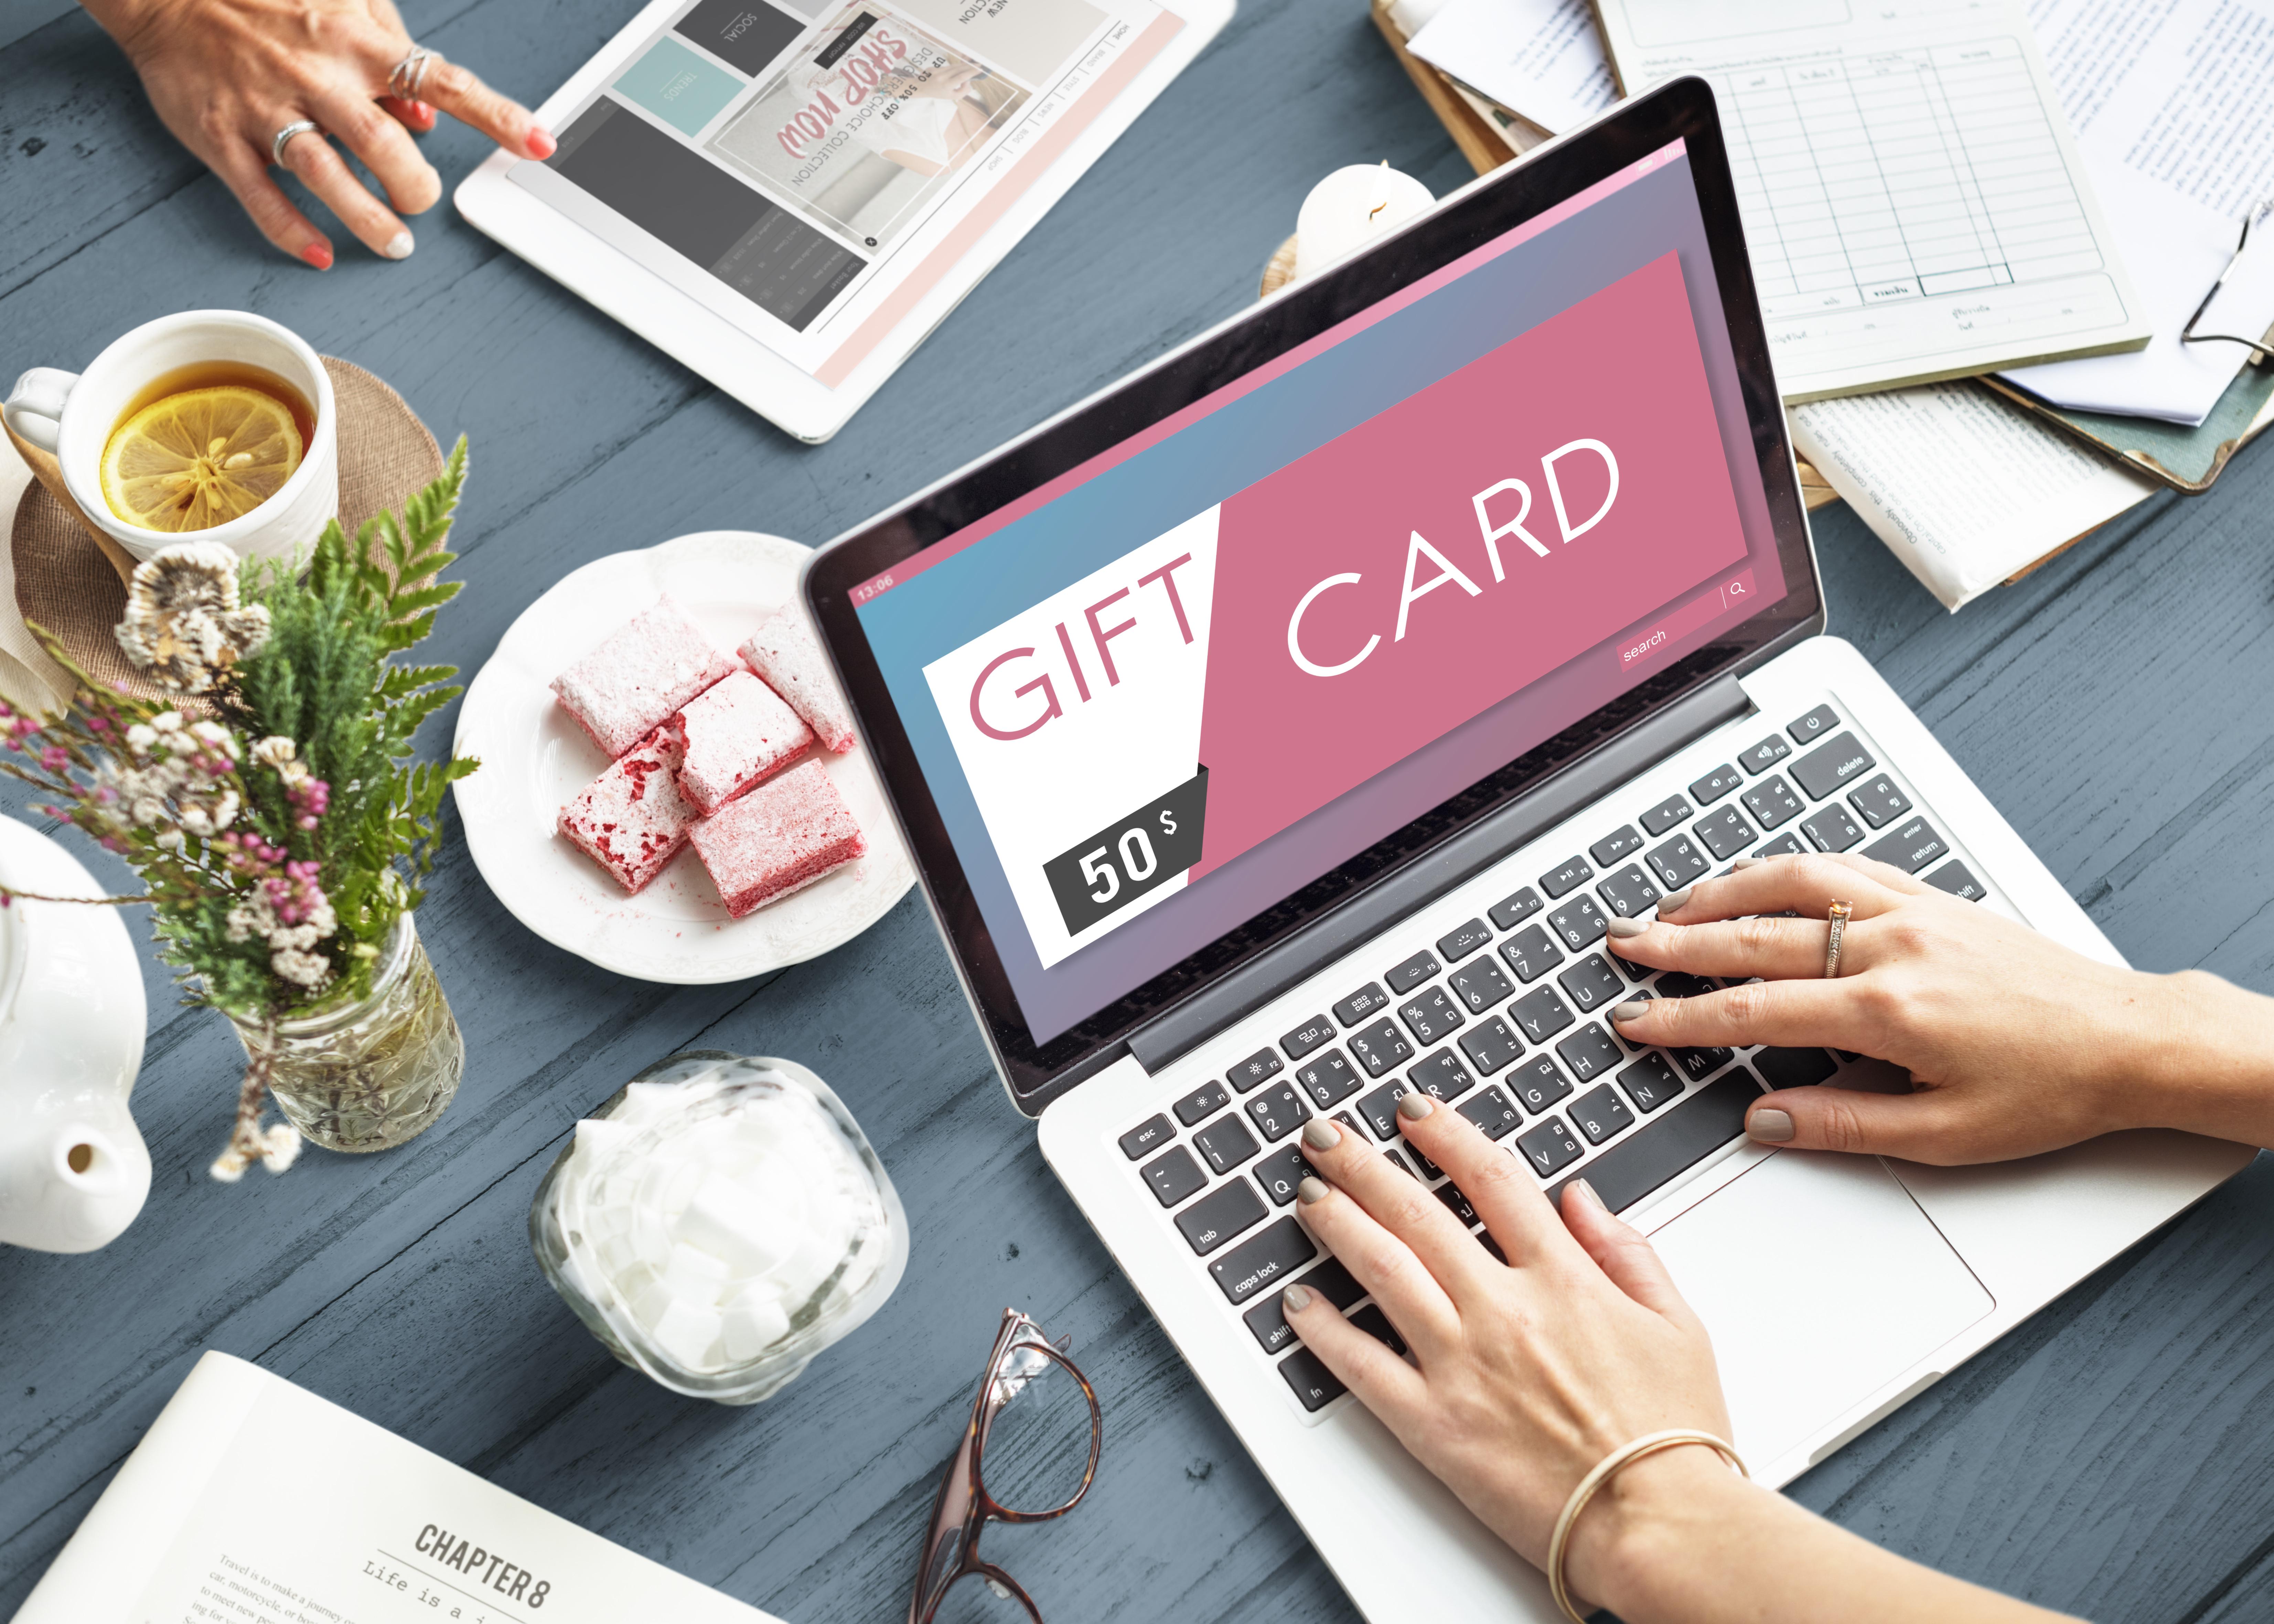 Online gift vouchers